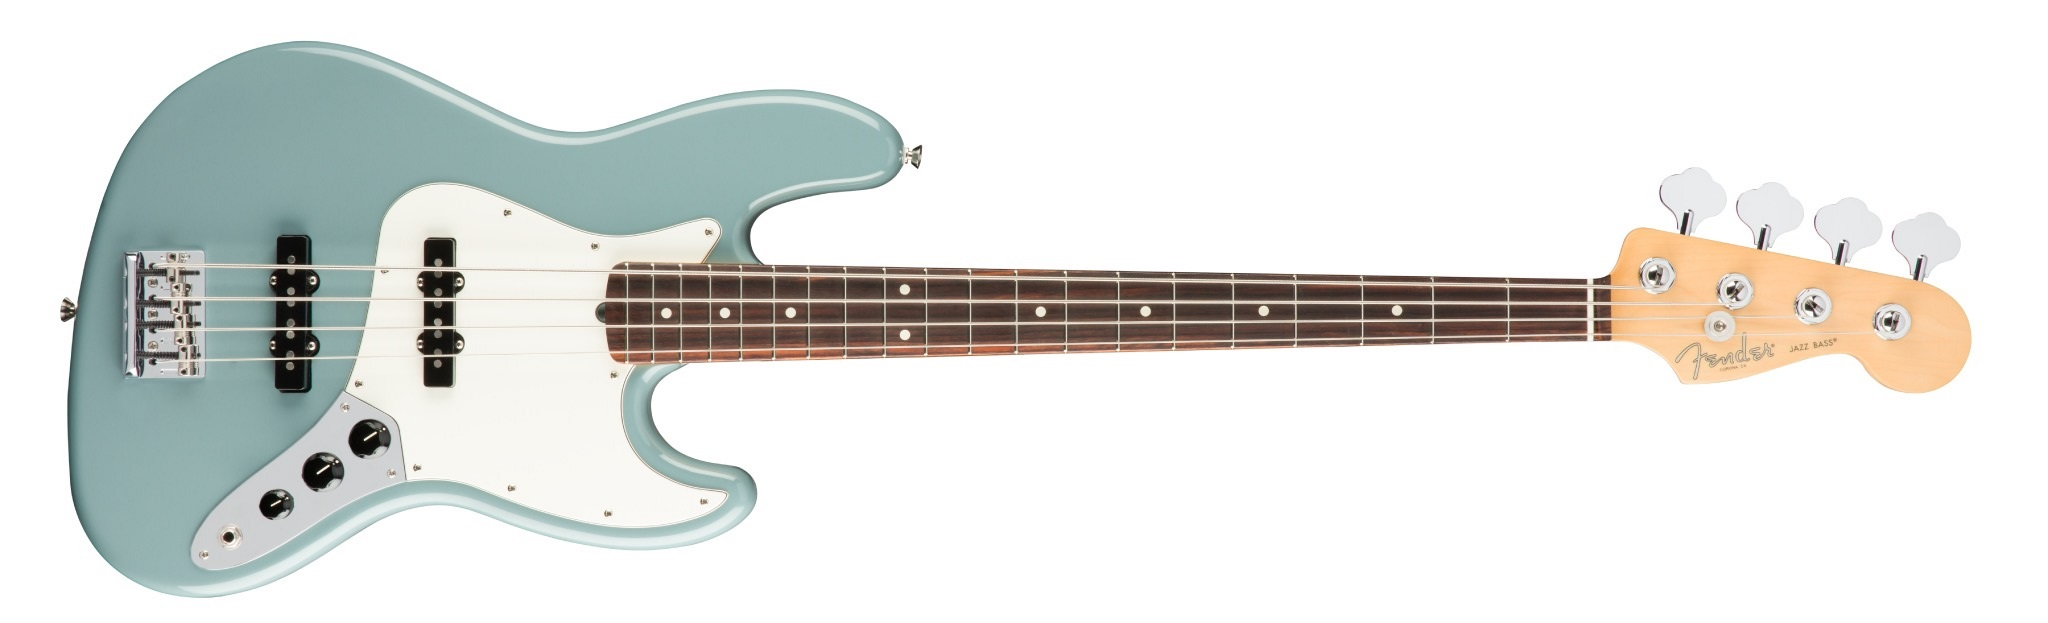 Fender American Professional Jazz Bass RW SNG